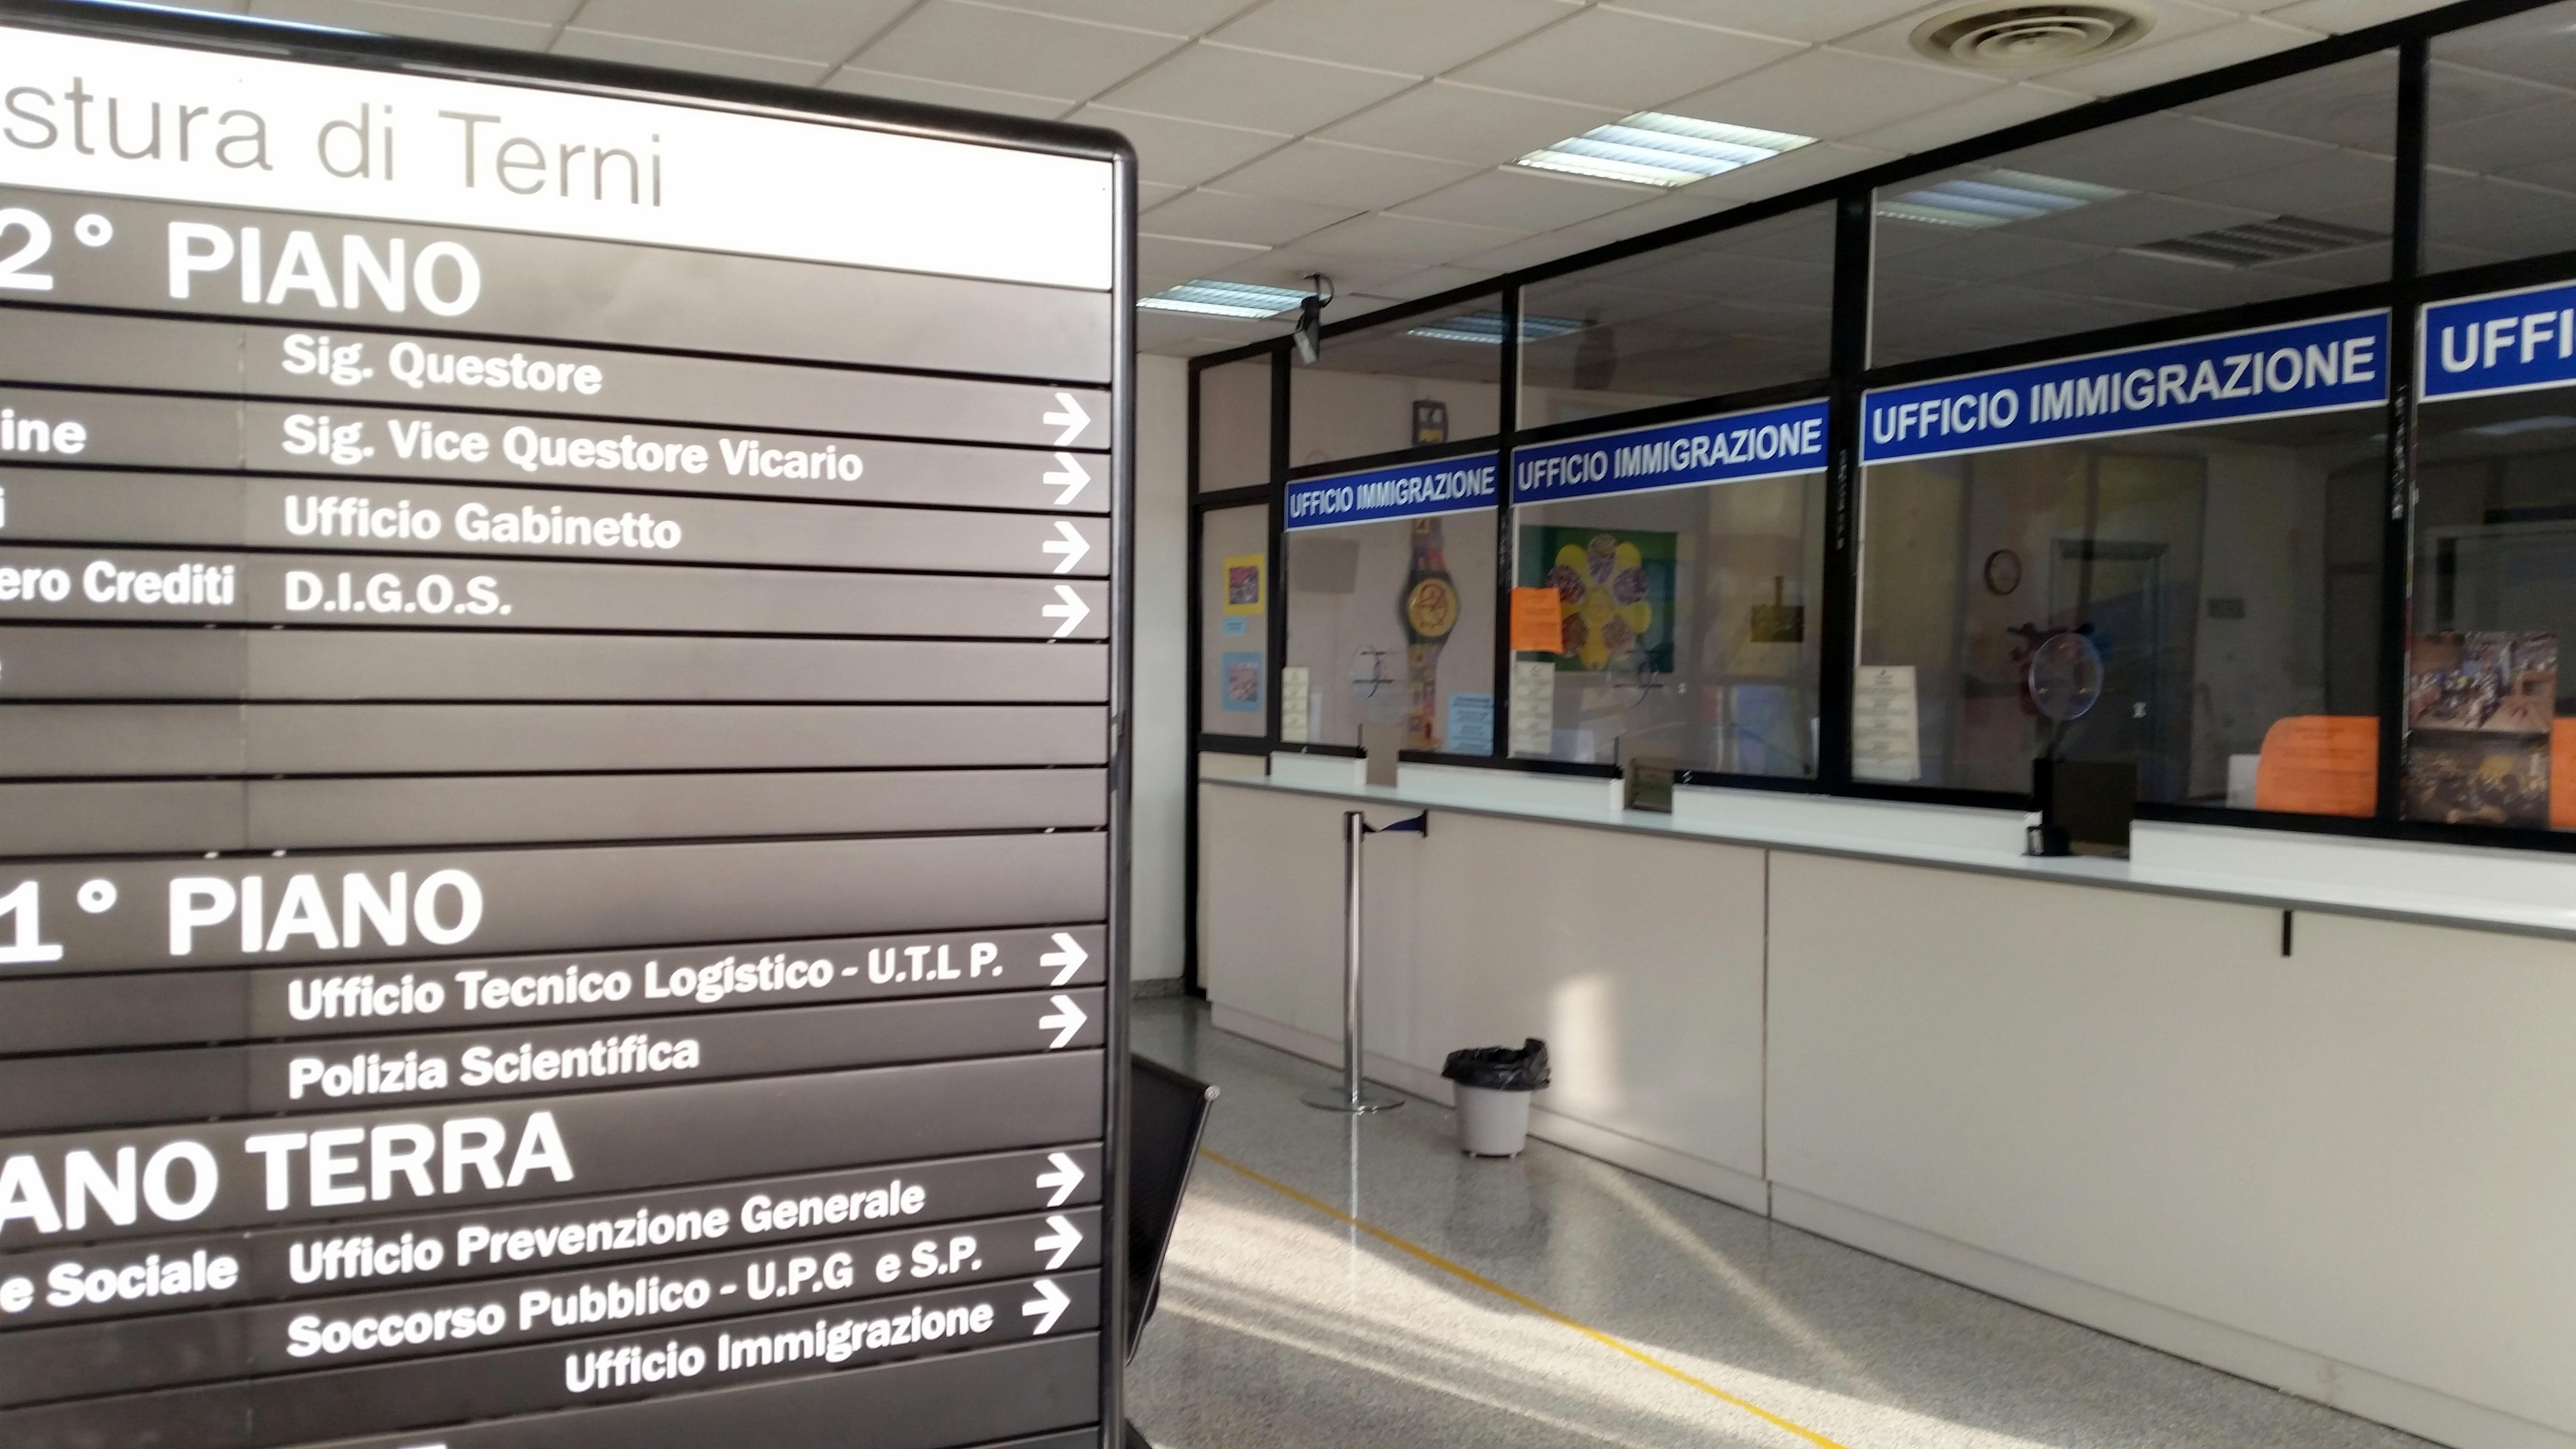 Terni, stranieri irregolari: Tre espulsioni - Cronache24